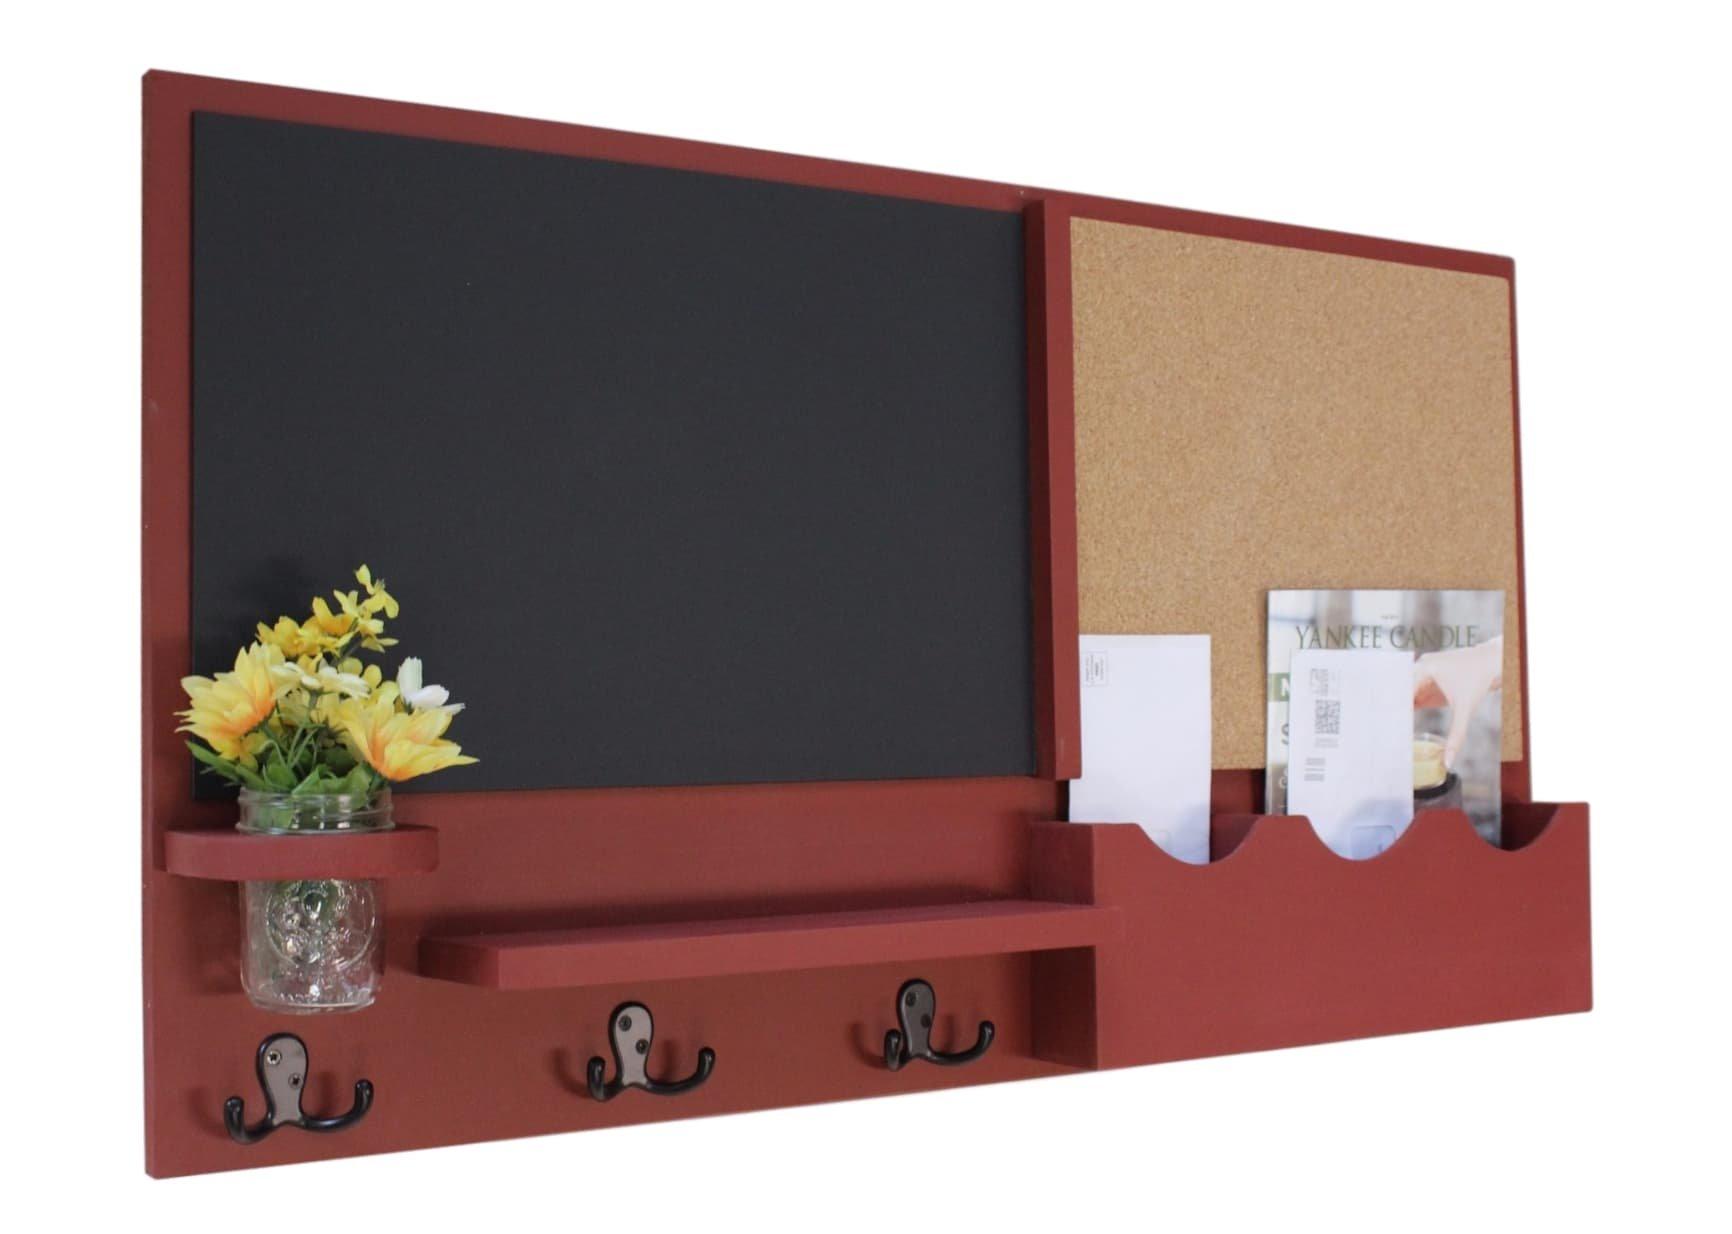 Legacy Studio Décor Message Center with Chalkboard Cork Board Mail Organizer Key Hooks Coat Hooks Mason Jar (Smooth, Barn Red)